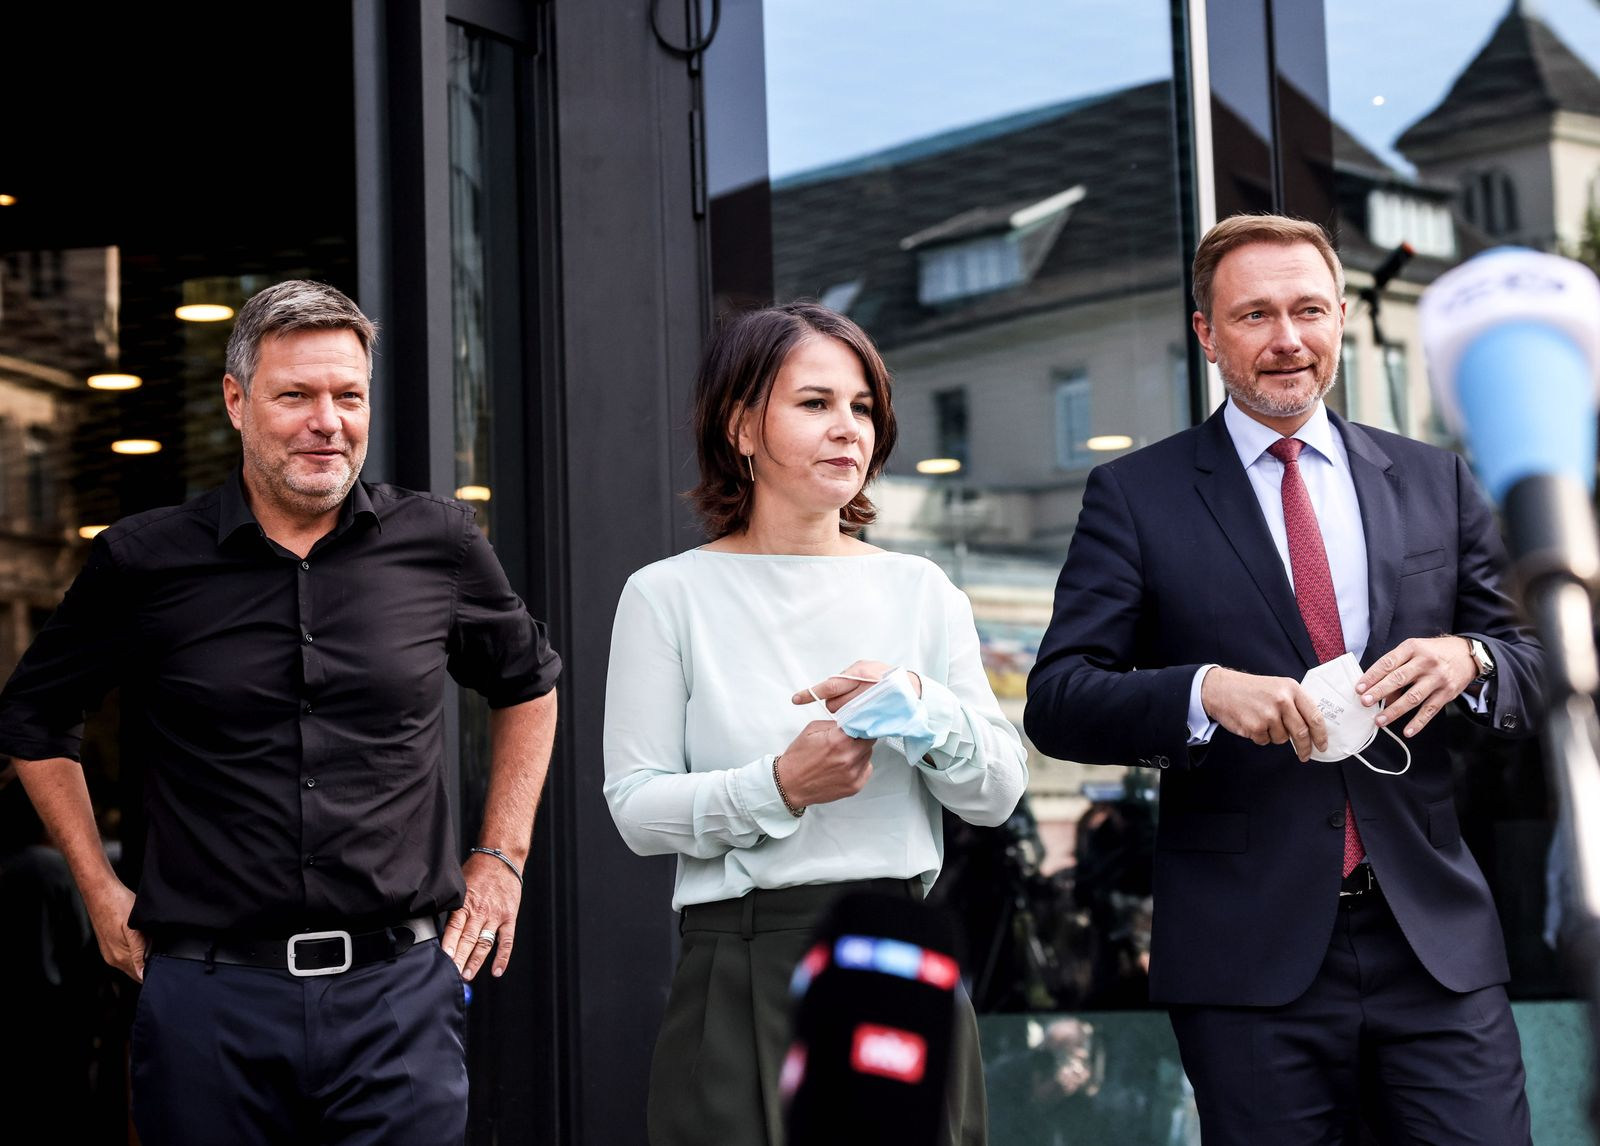 Free Democratic Party (FDP) - Green party exploratory talks